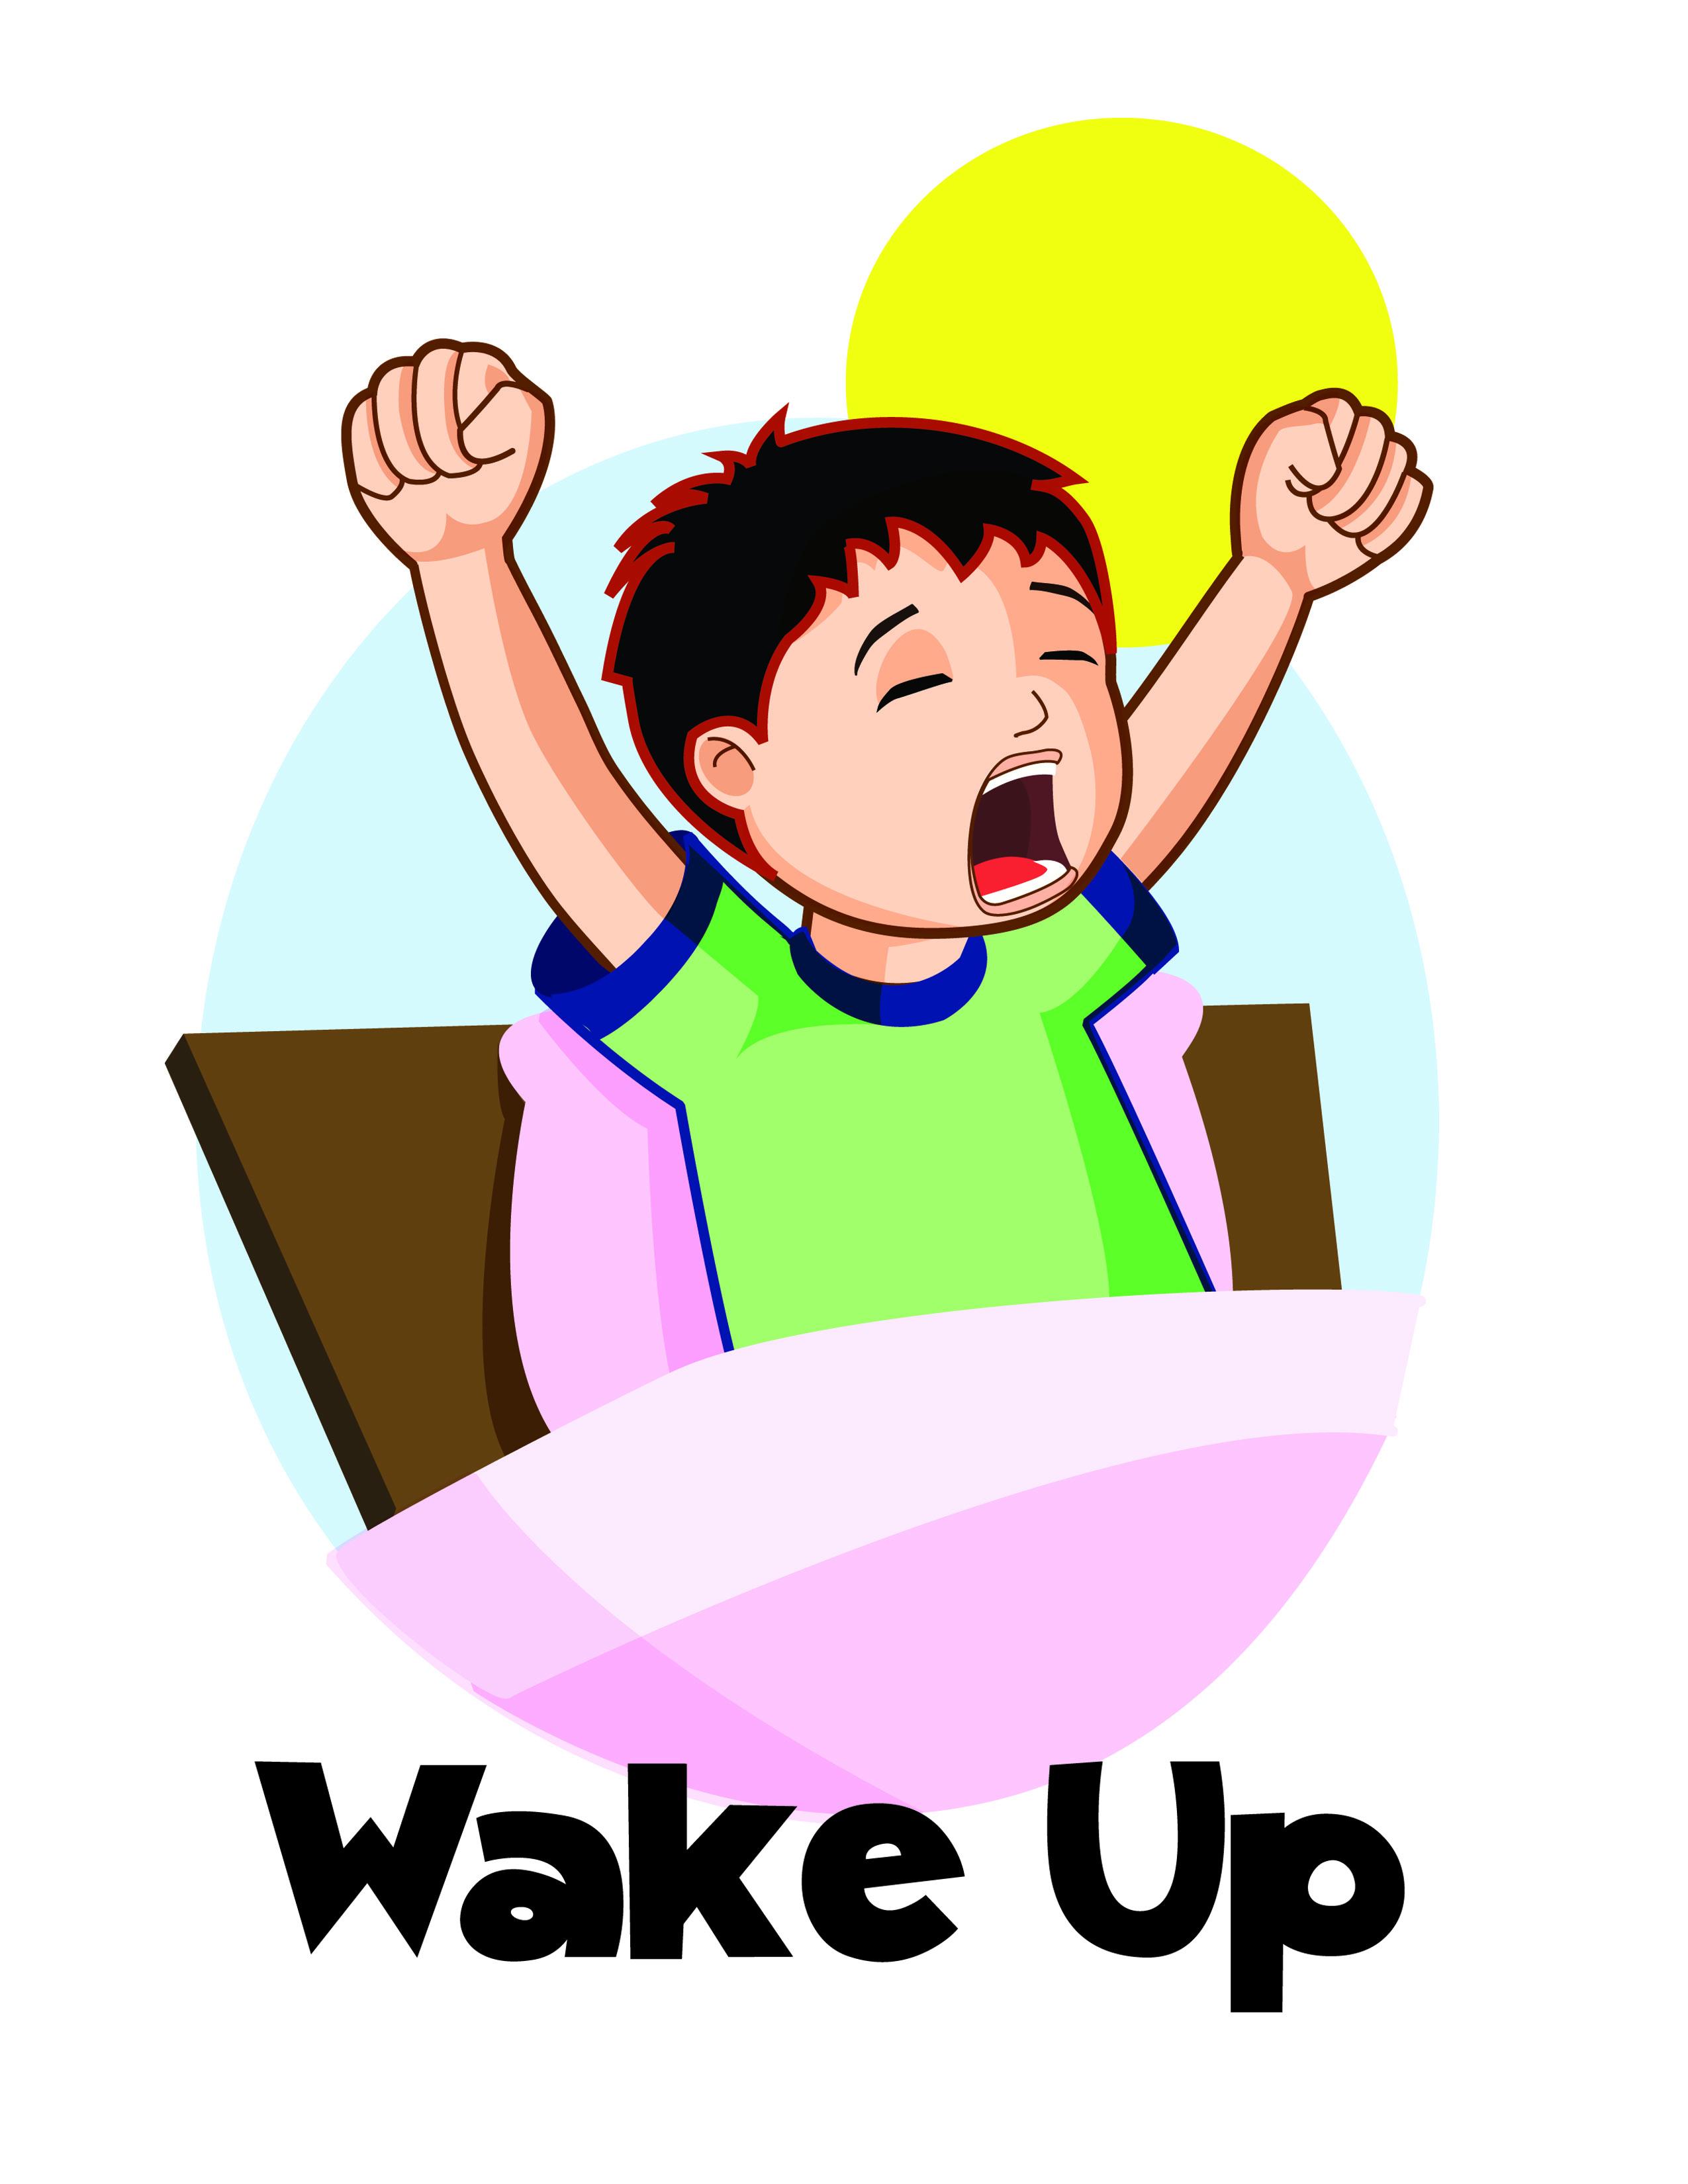 Wake Up Clipart Cliparts Co-Wake Up Clipart Cliparts Co-11